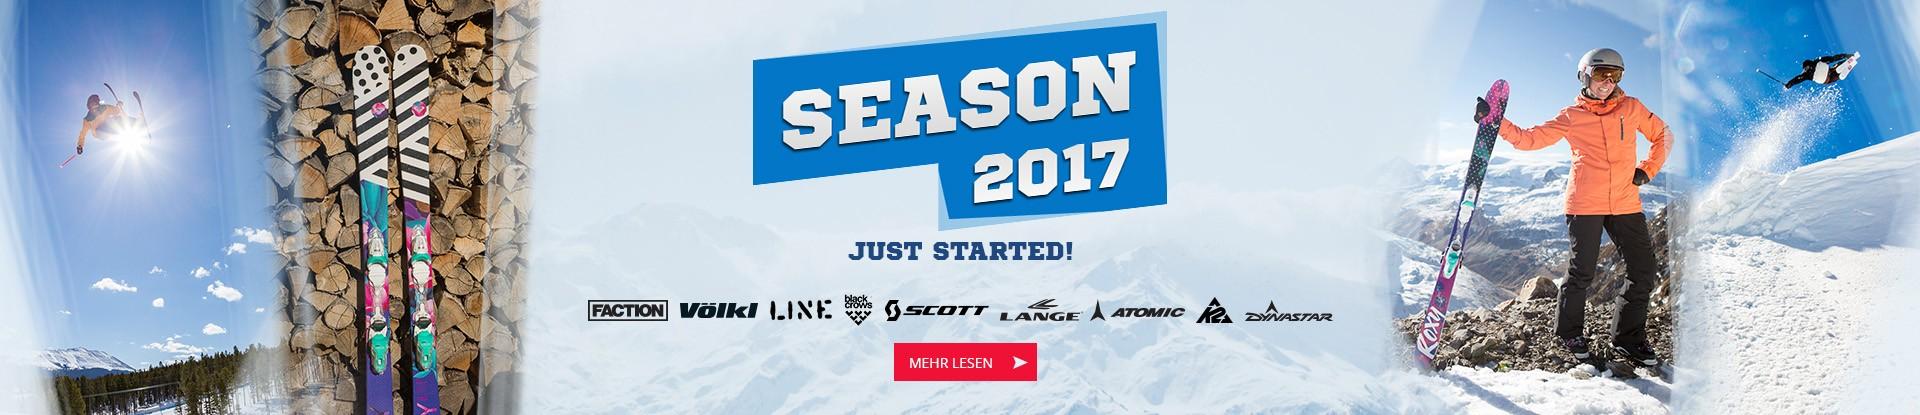 season 2017